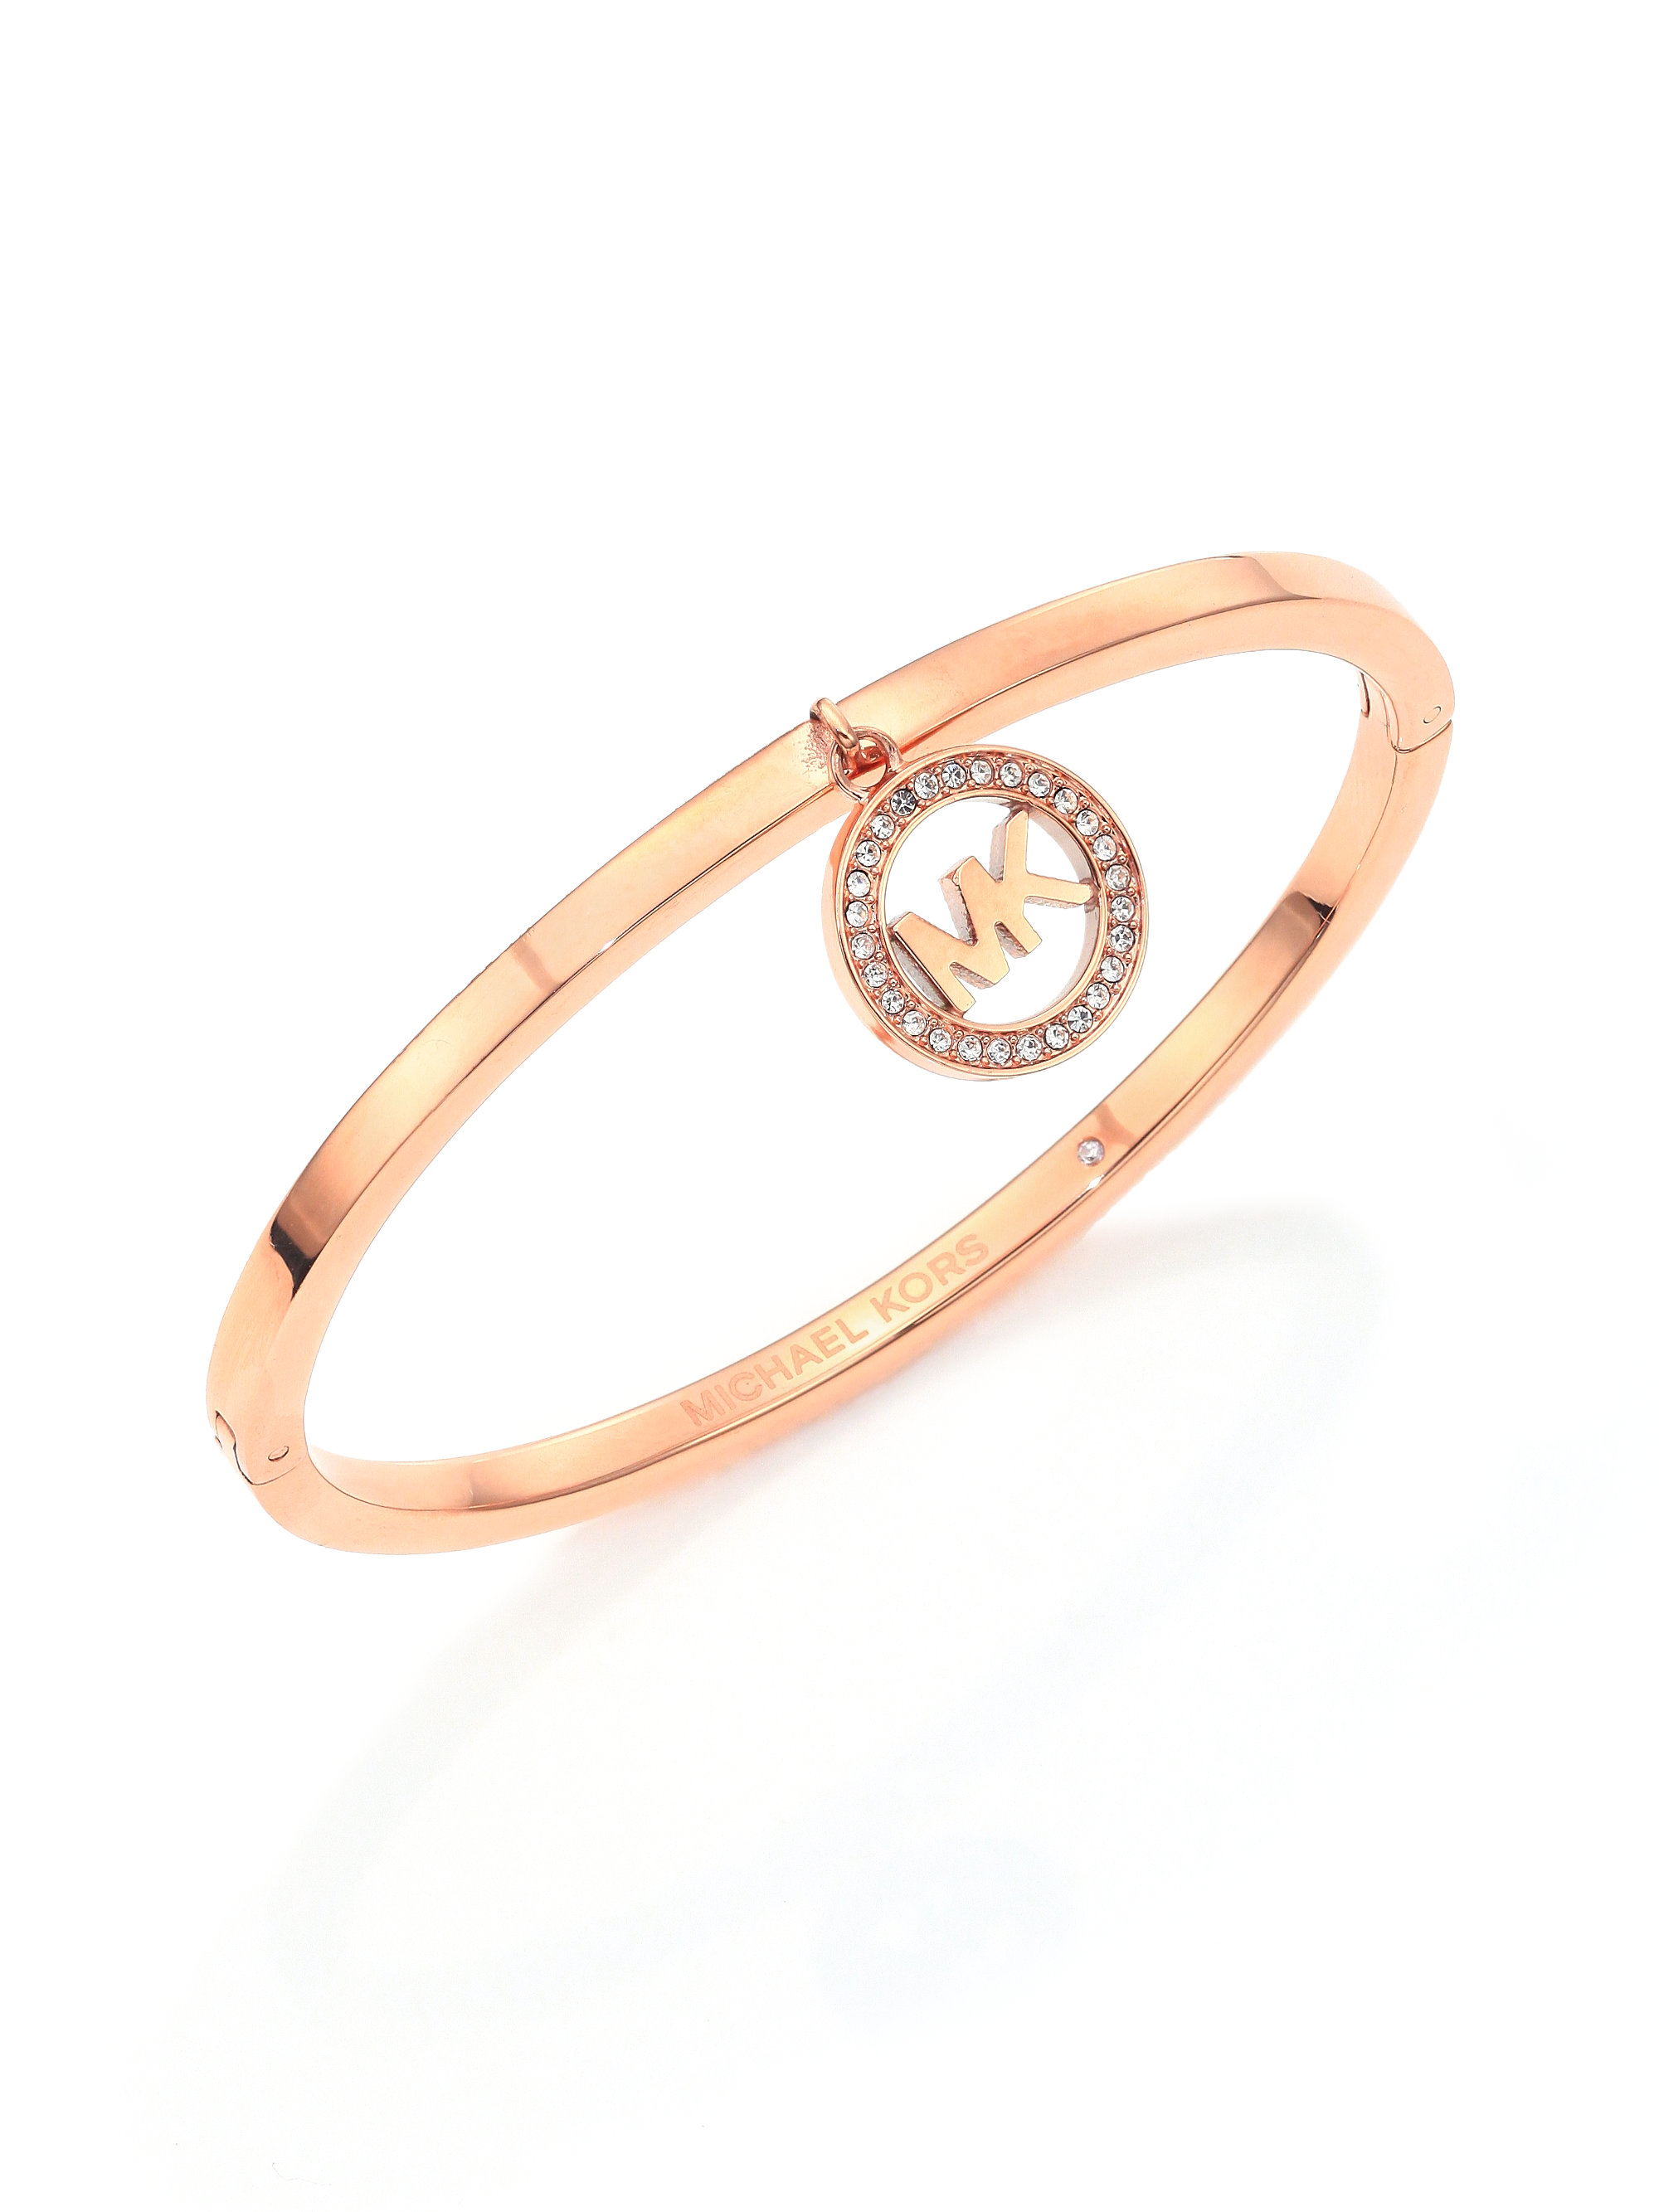 a36276a1b9ae Lyst - Michael Kors Fulton Logo Charm Bangle Bracelet rose Goldtone ...